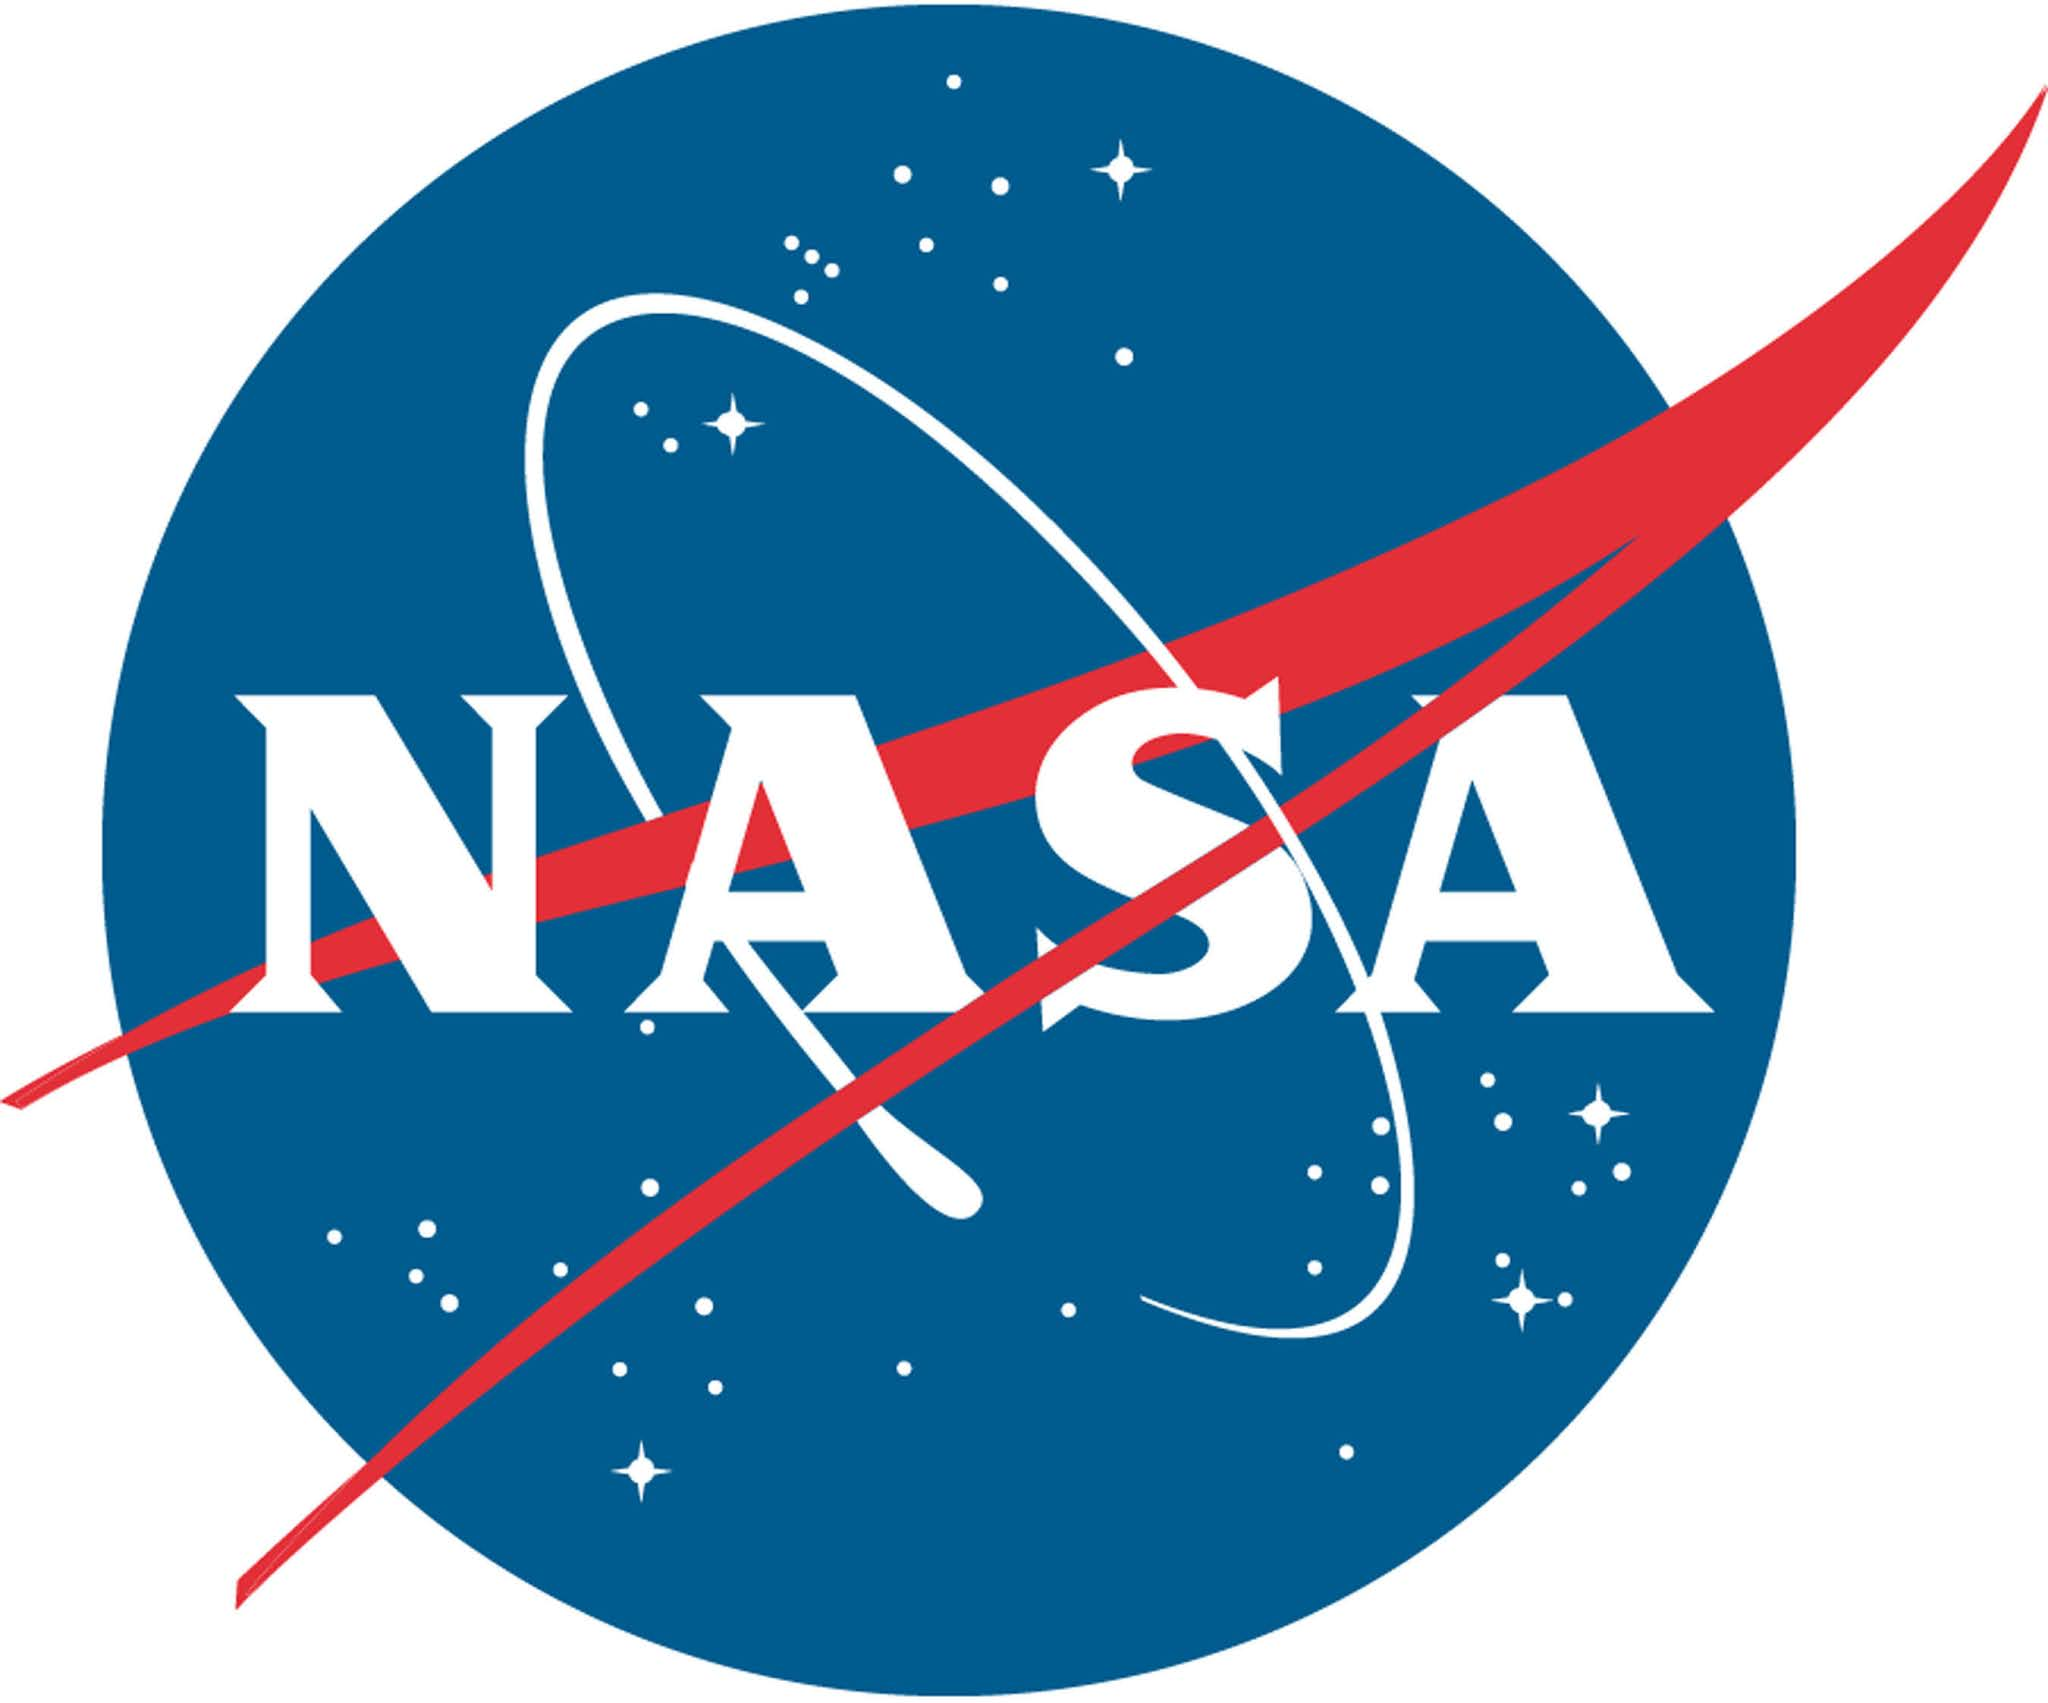 NASA Schedules Live Coverage of Russian Spacewalk